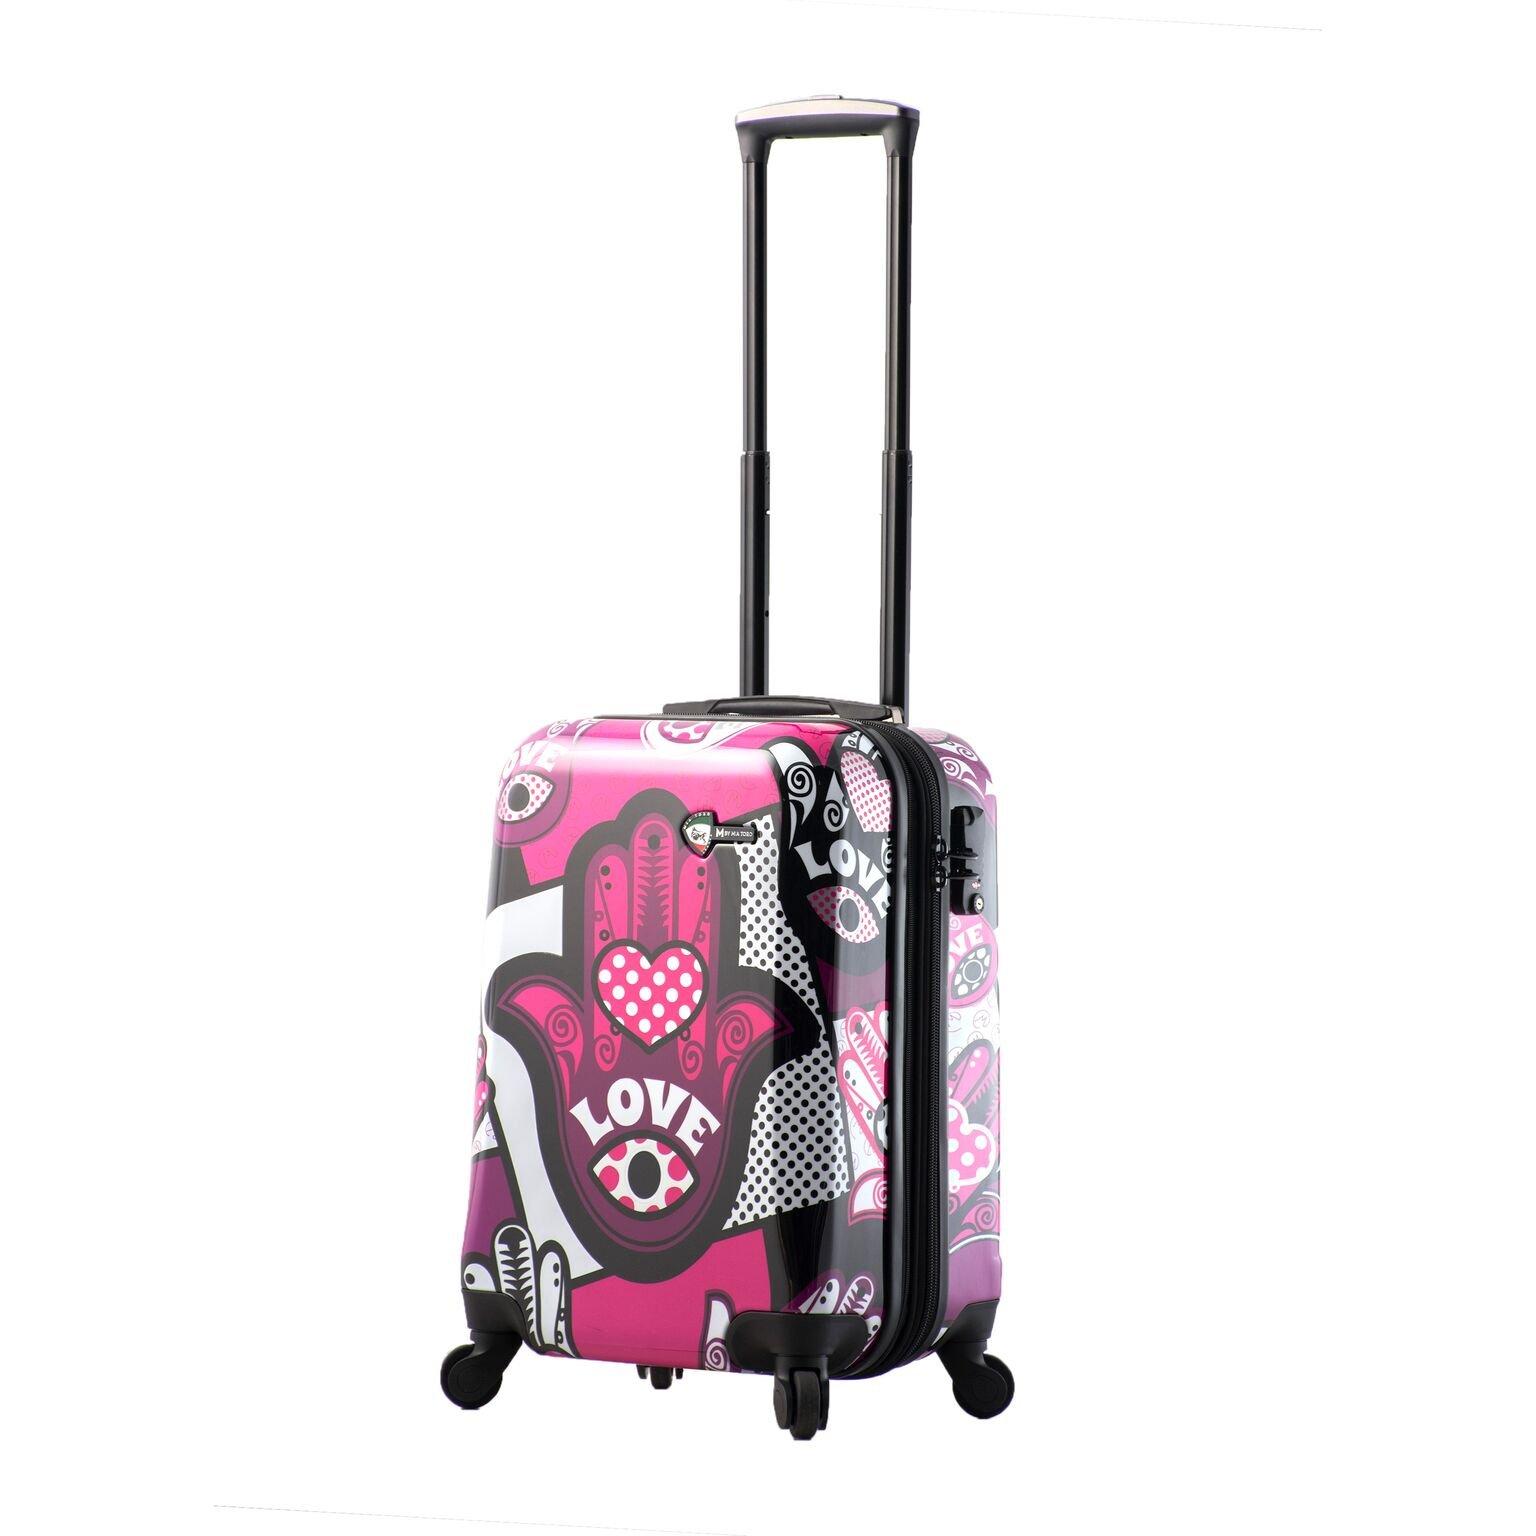 Mia Toro Italy Hamsa Love Monochrome Hard Side Spinner Luggage 20'' Carry-on, Pink